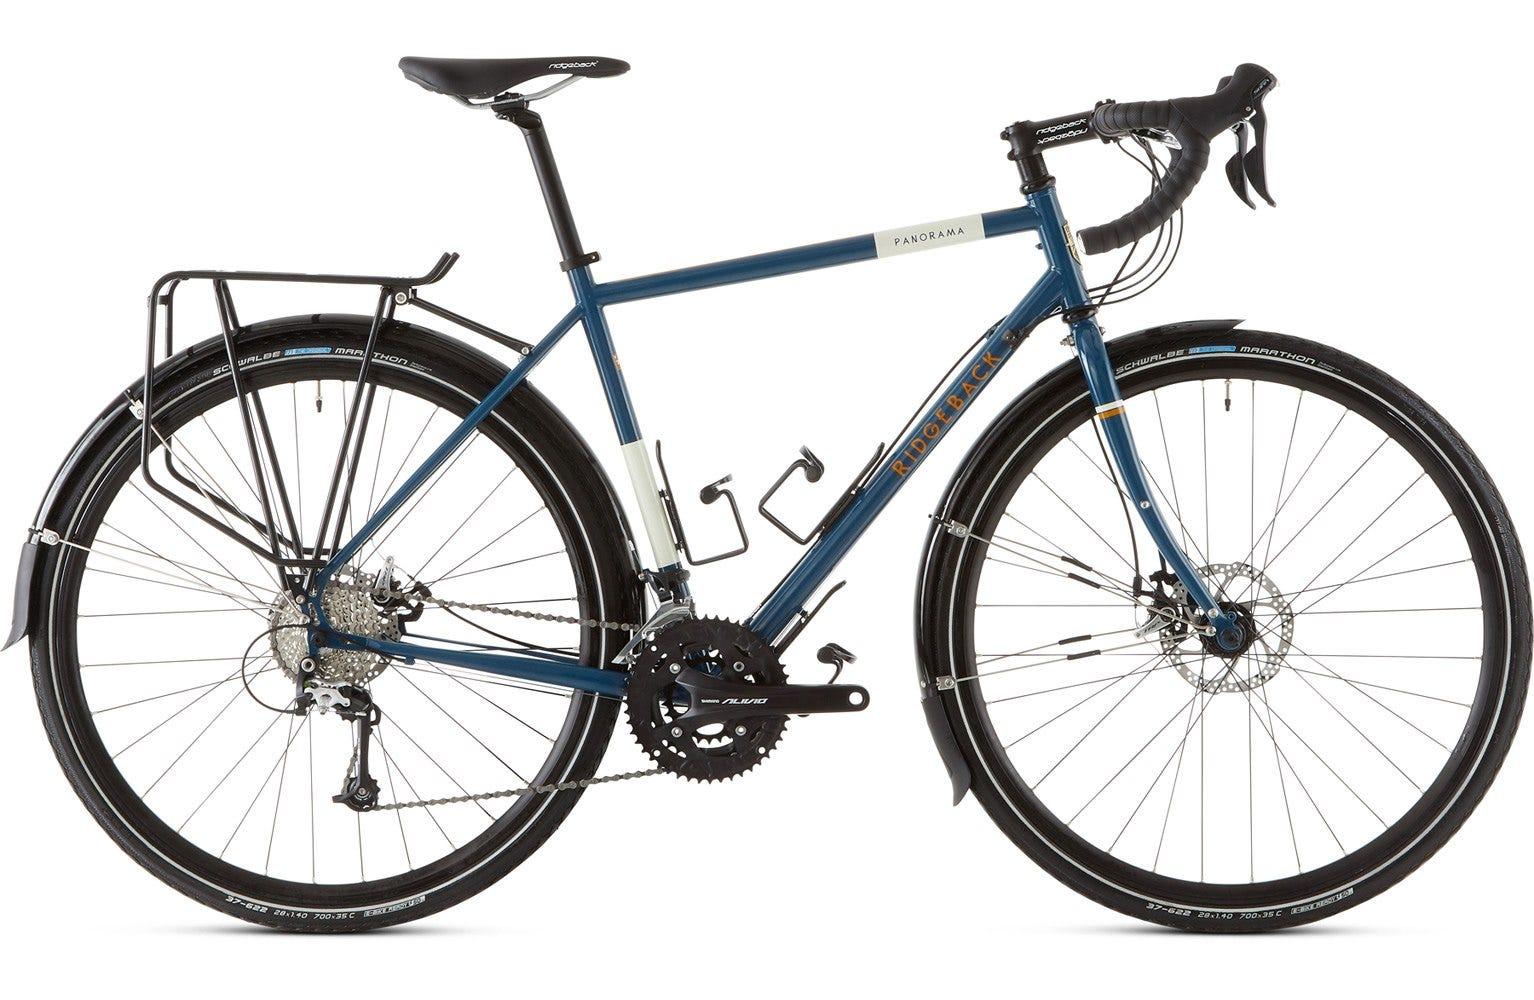 Ridgeback Panorama bike 2019